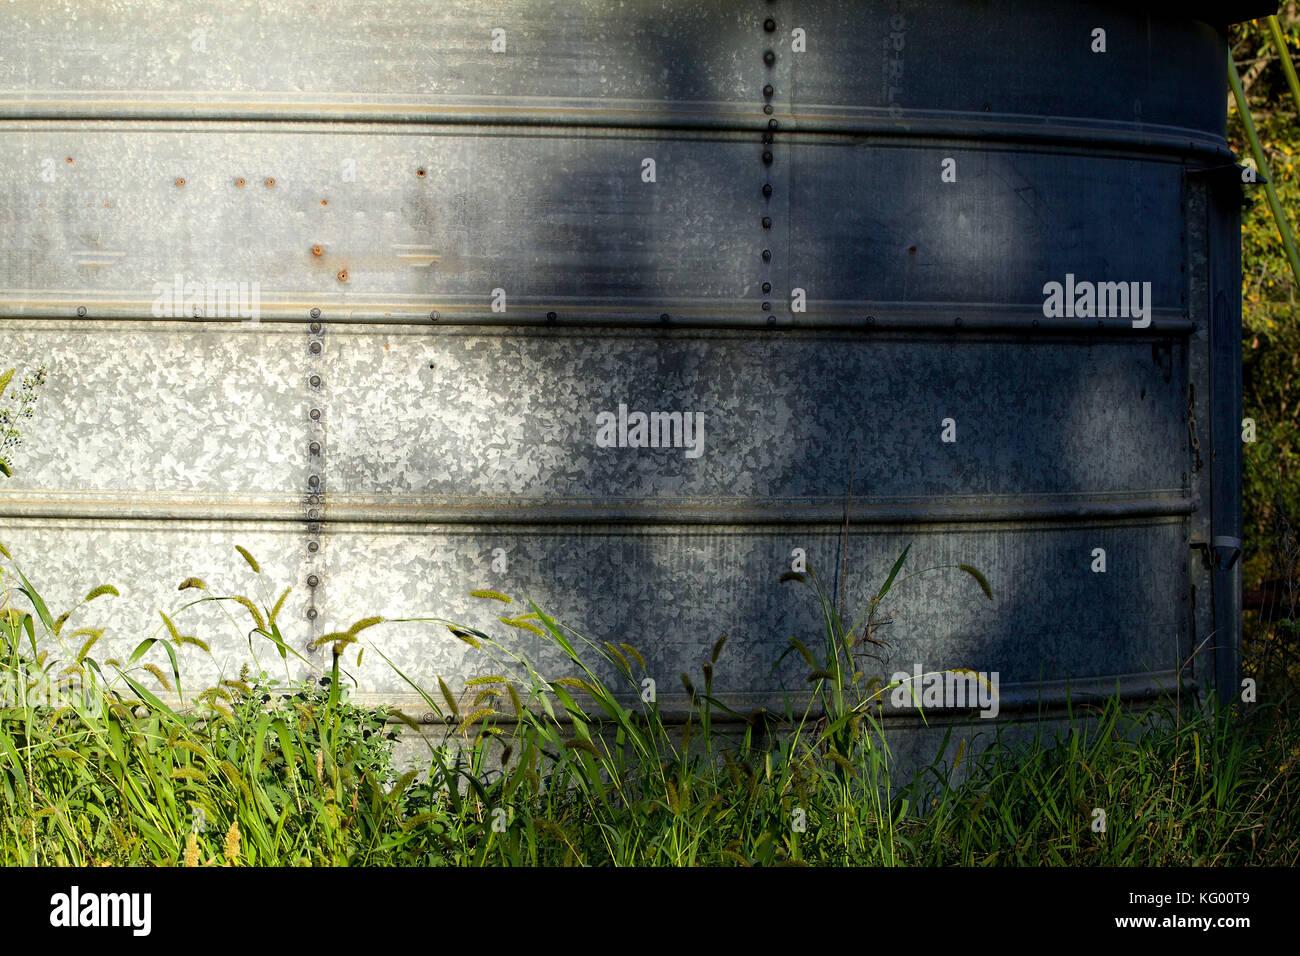 Galvanized bin in the green grass - Stock Image